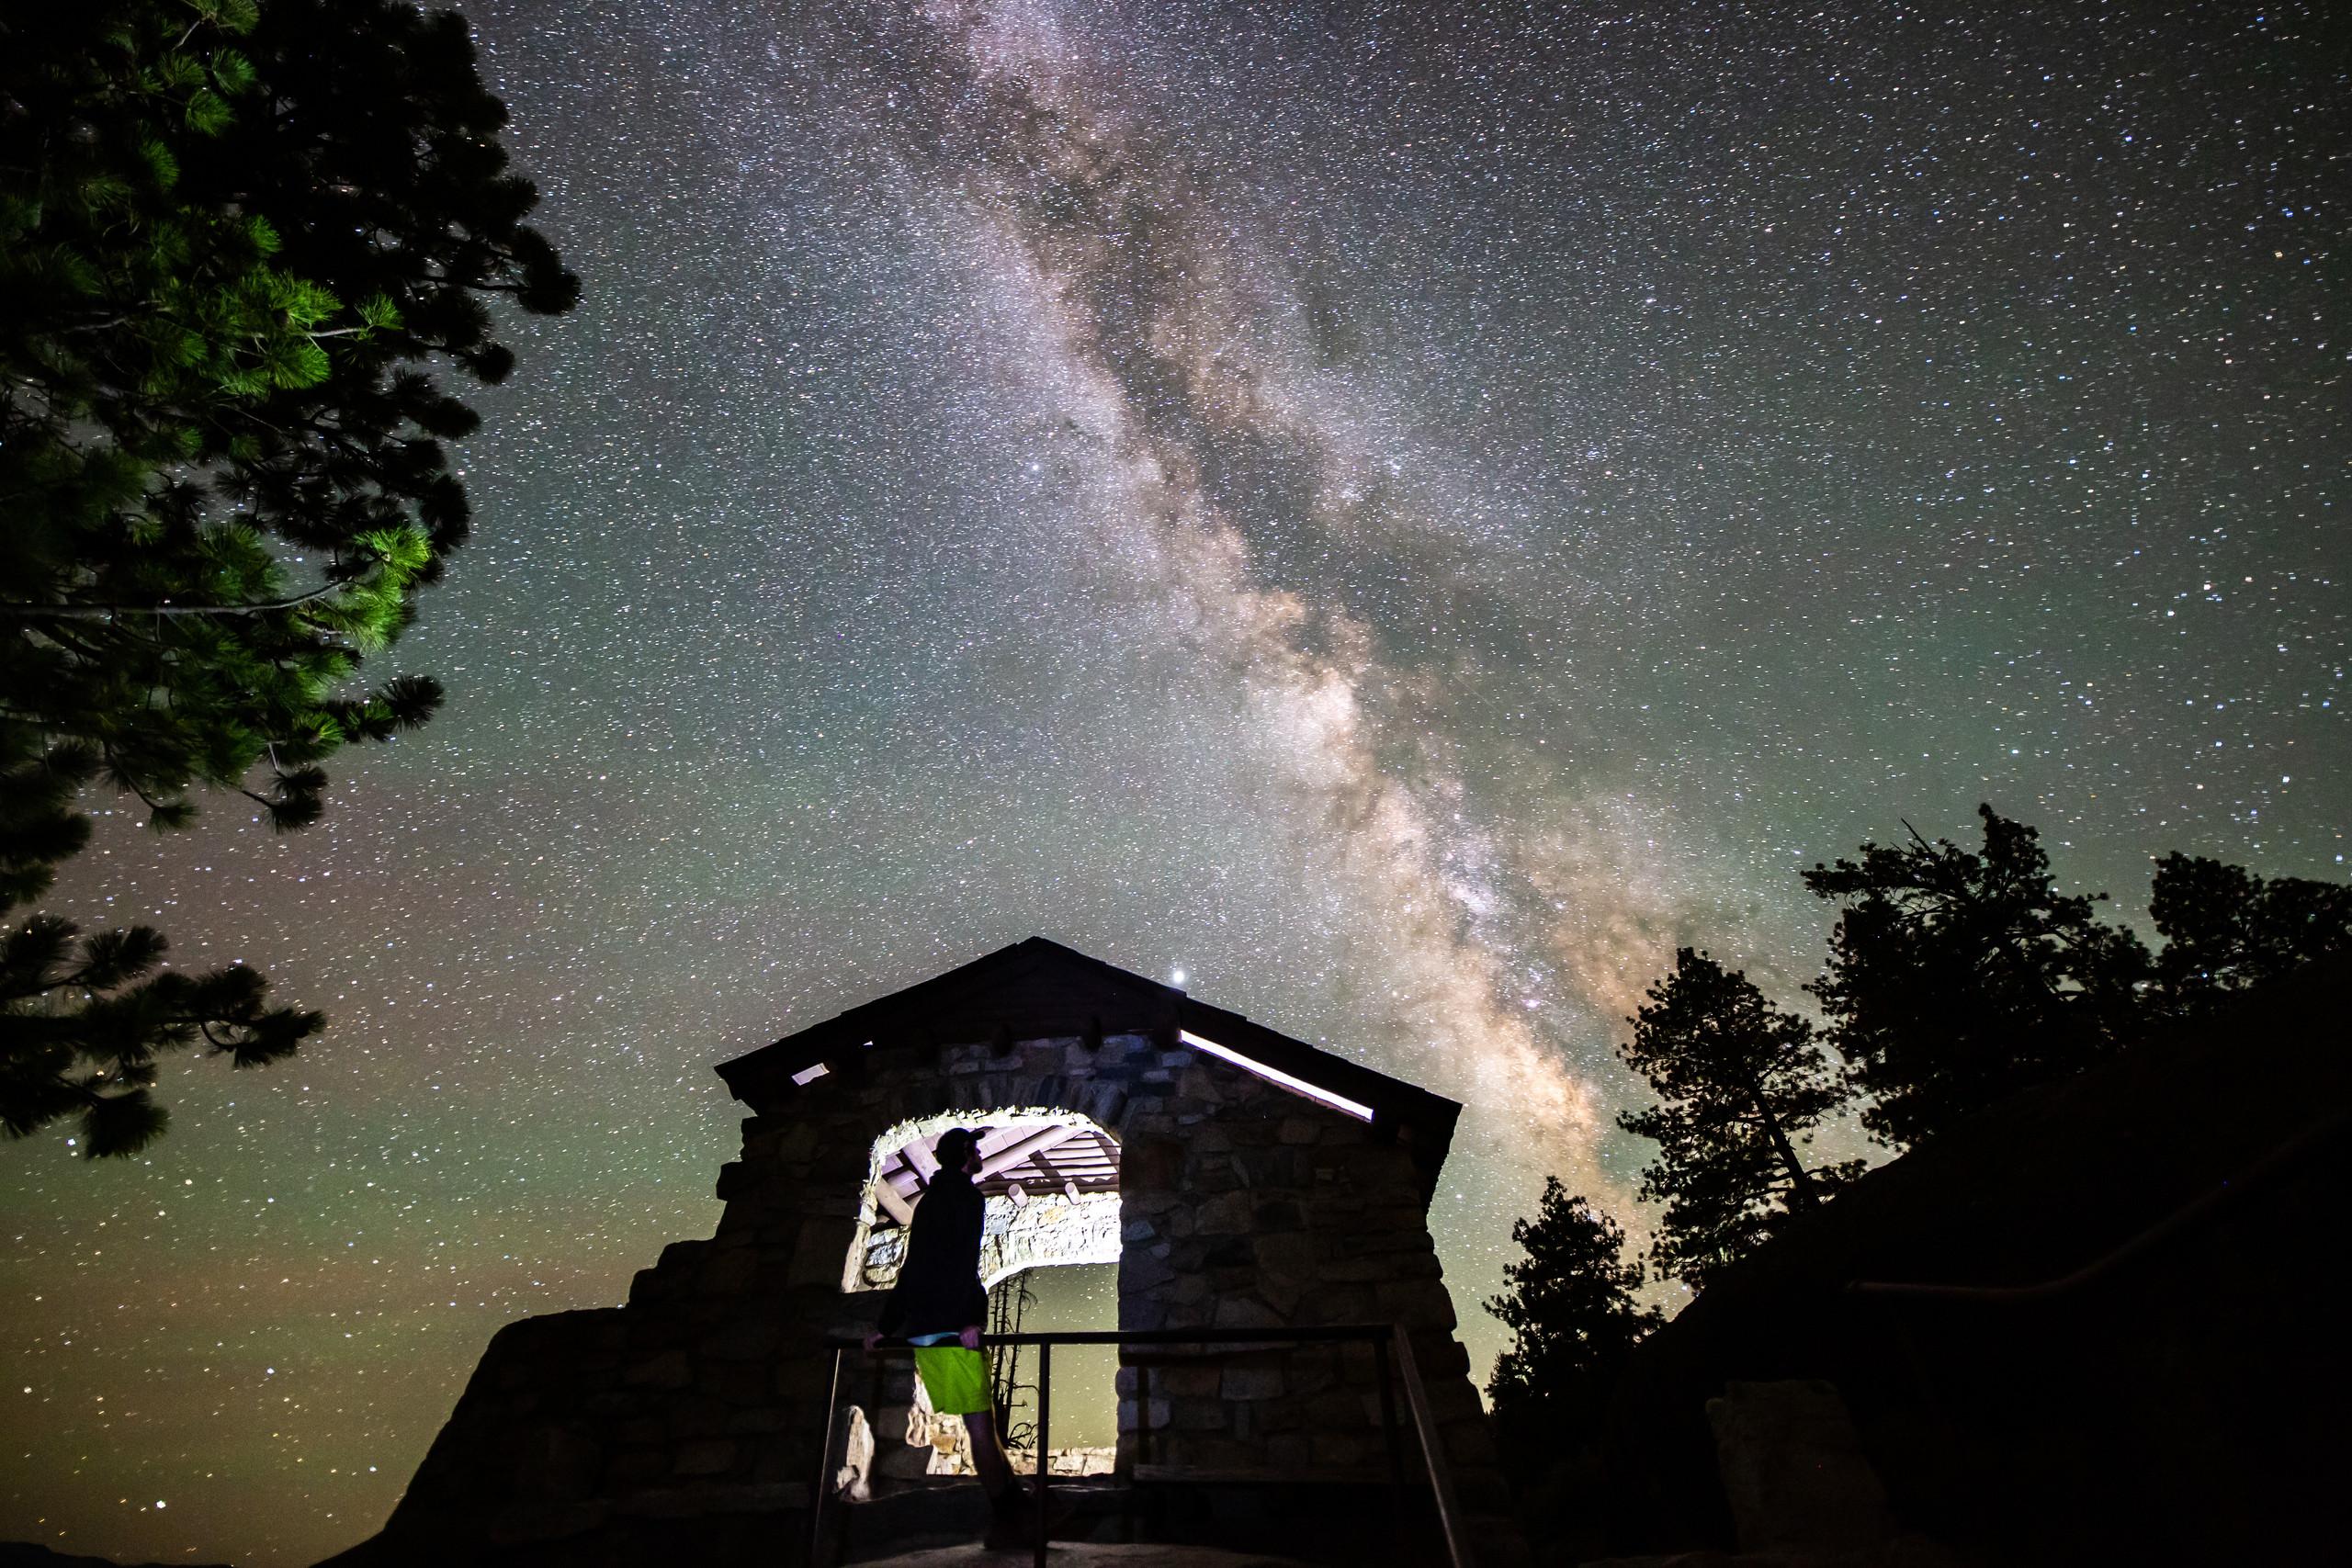 Milky Way Yosemite